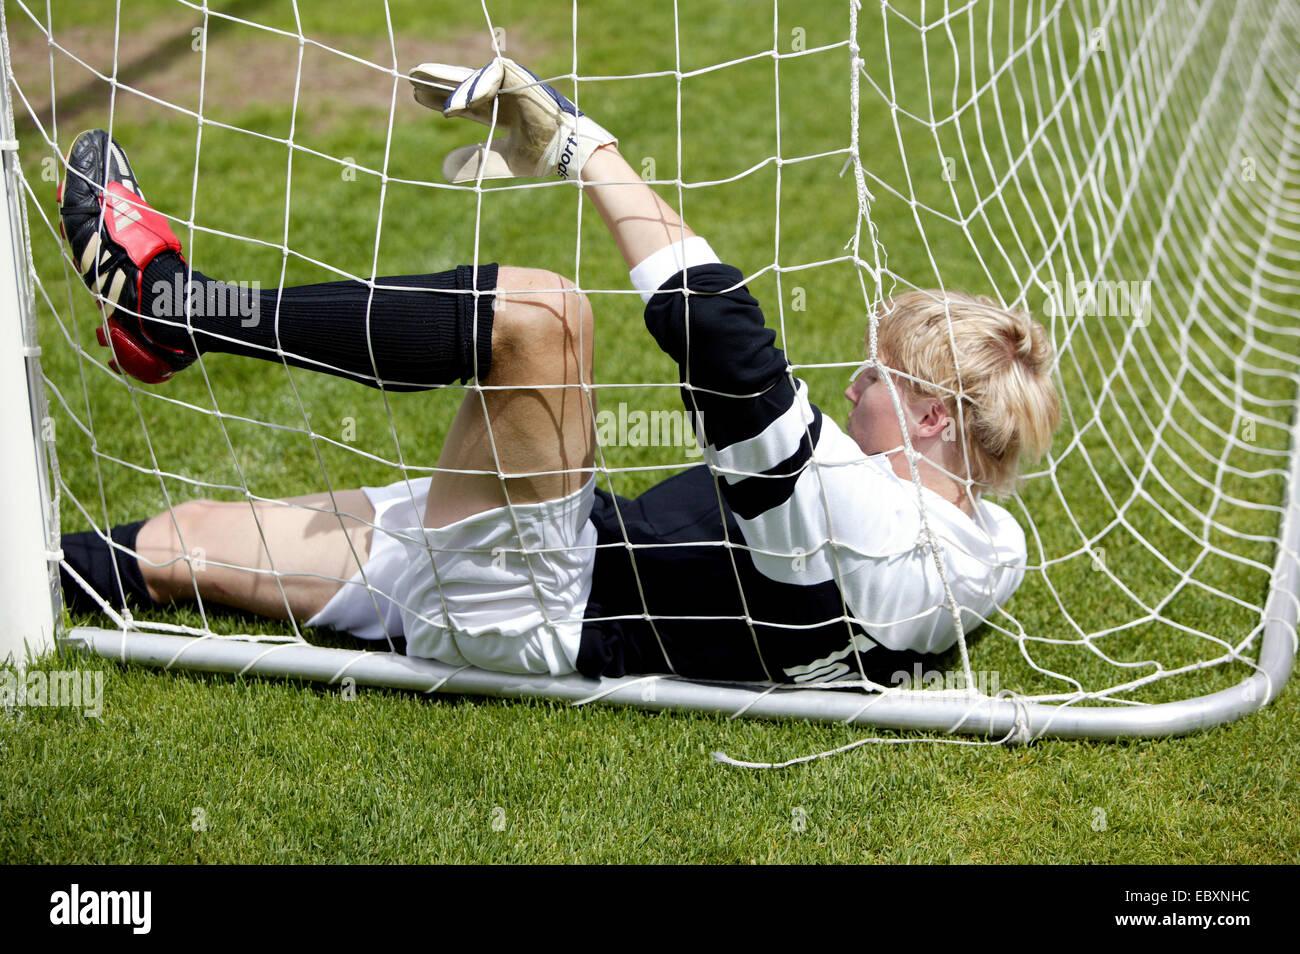 football player, goalkeeper keeping goal - Stock Image